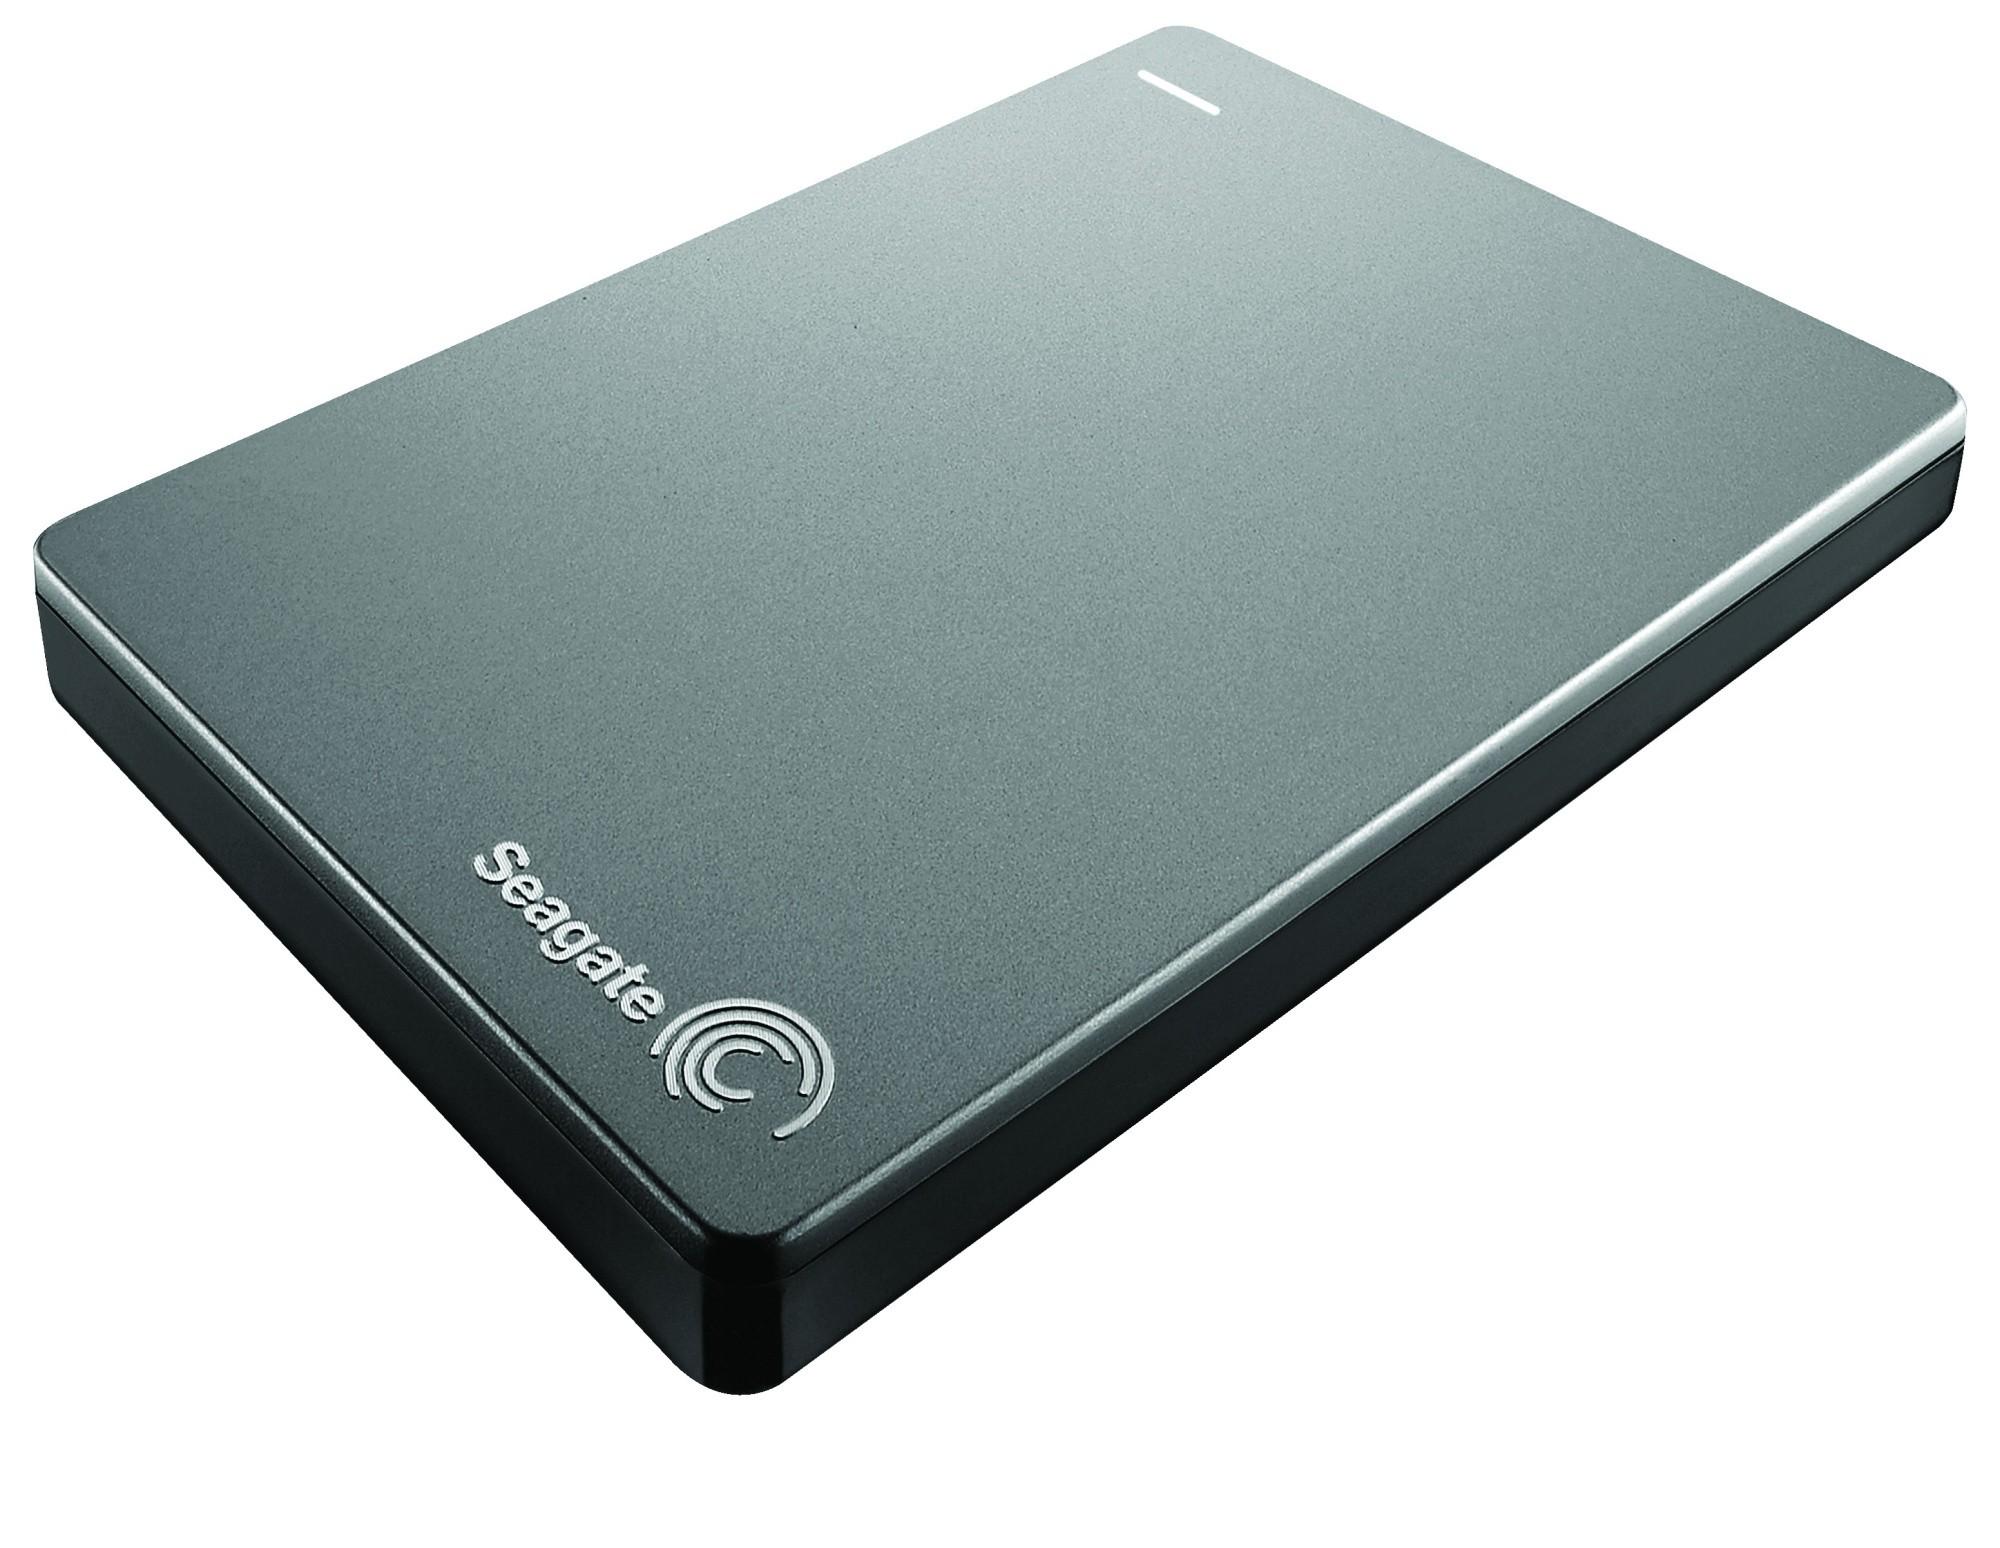 seagate 1tb backup plus portable external usb 3 0 hard. Black Bedroom Furniture Sets. Home Design Ideas